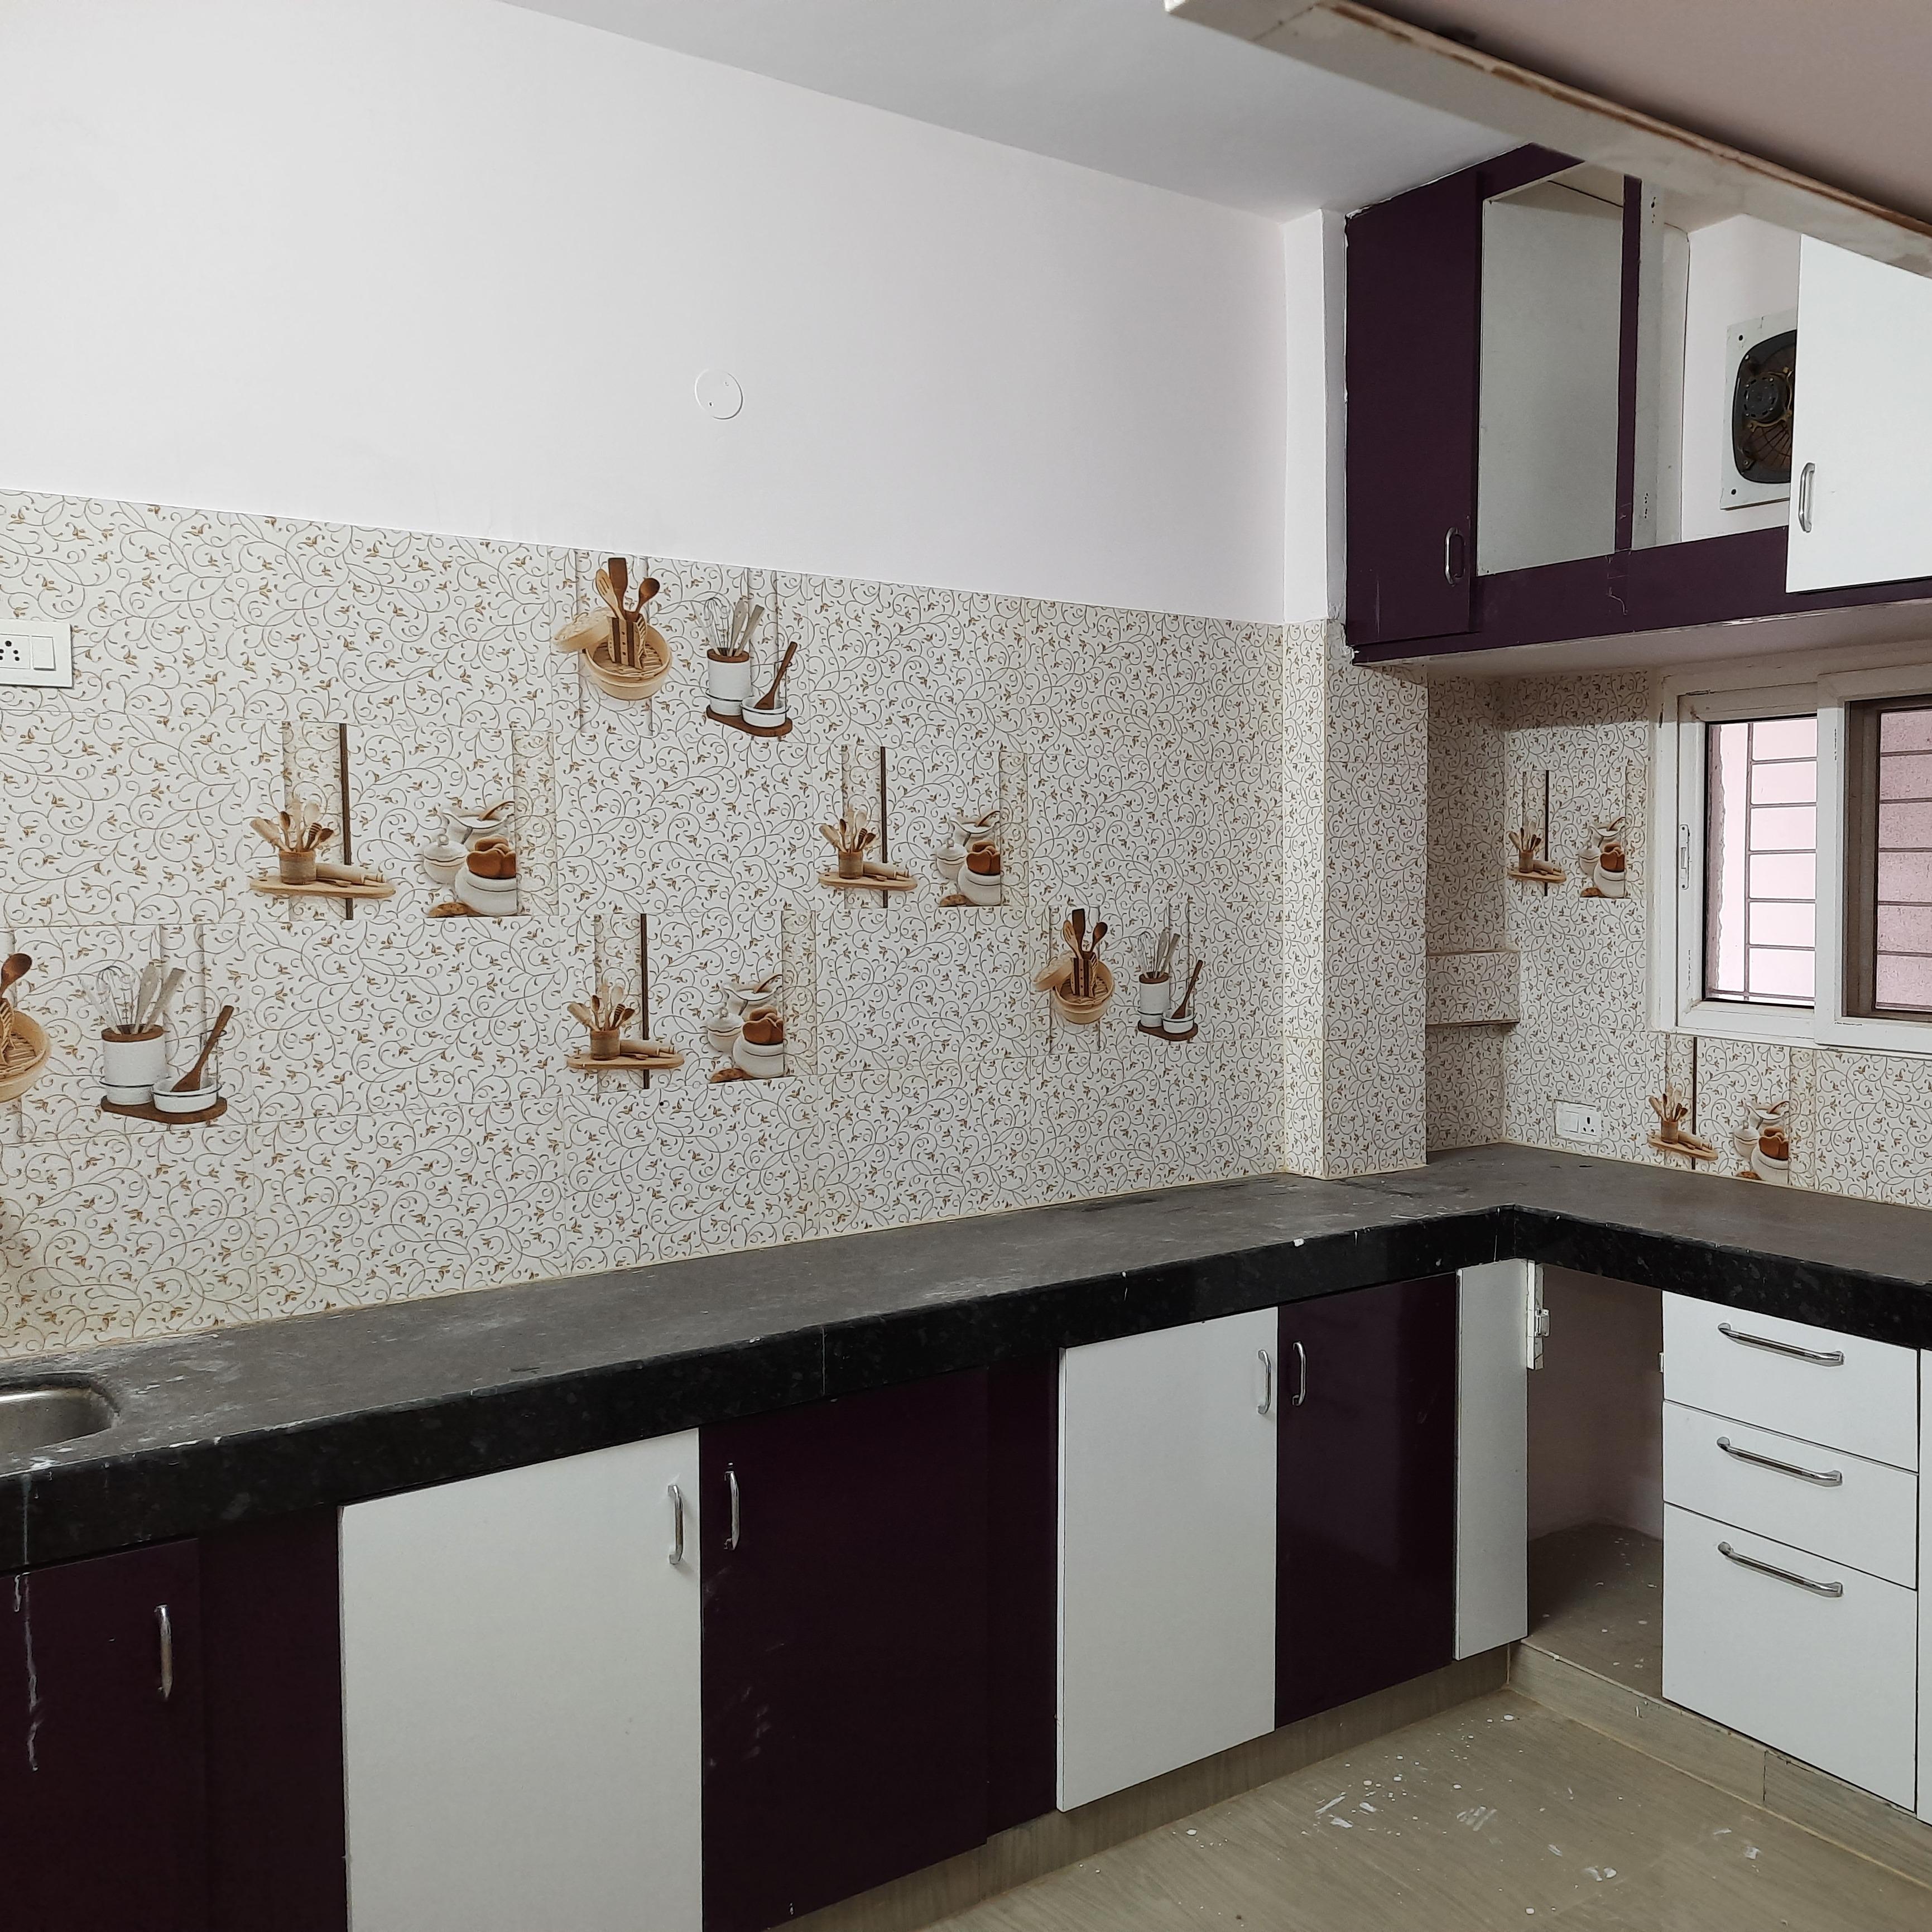 kitchen-Picture-serilingampally-2372432